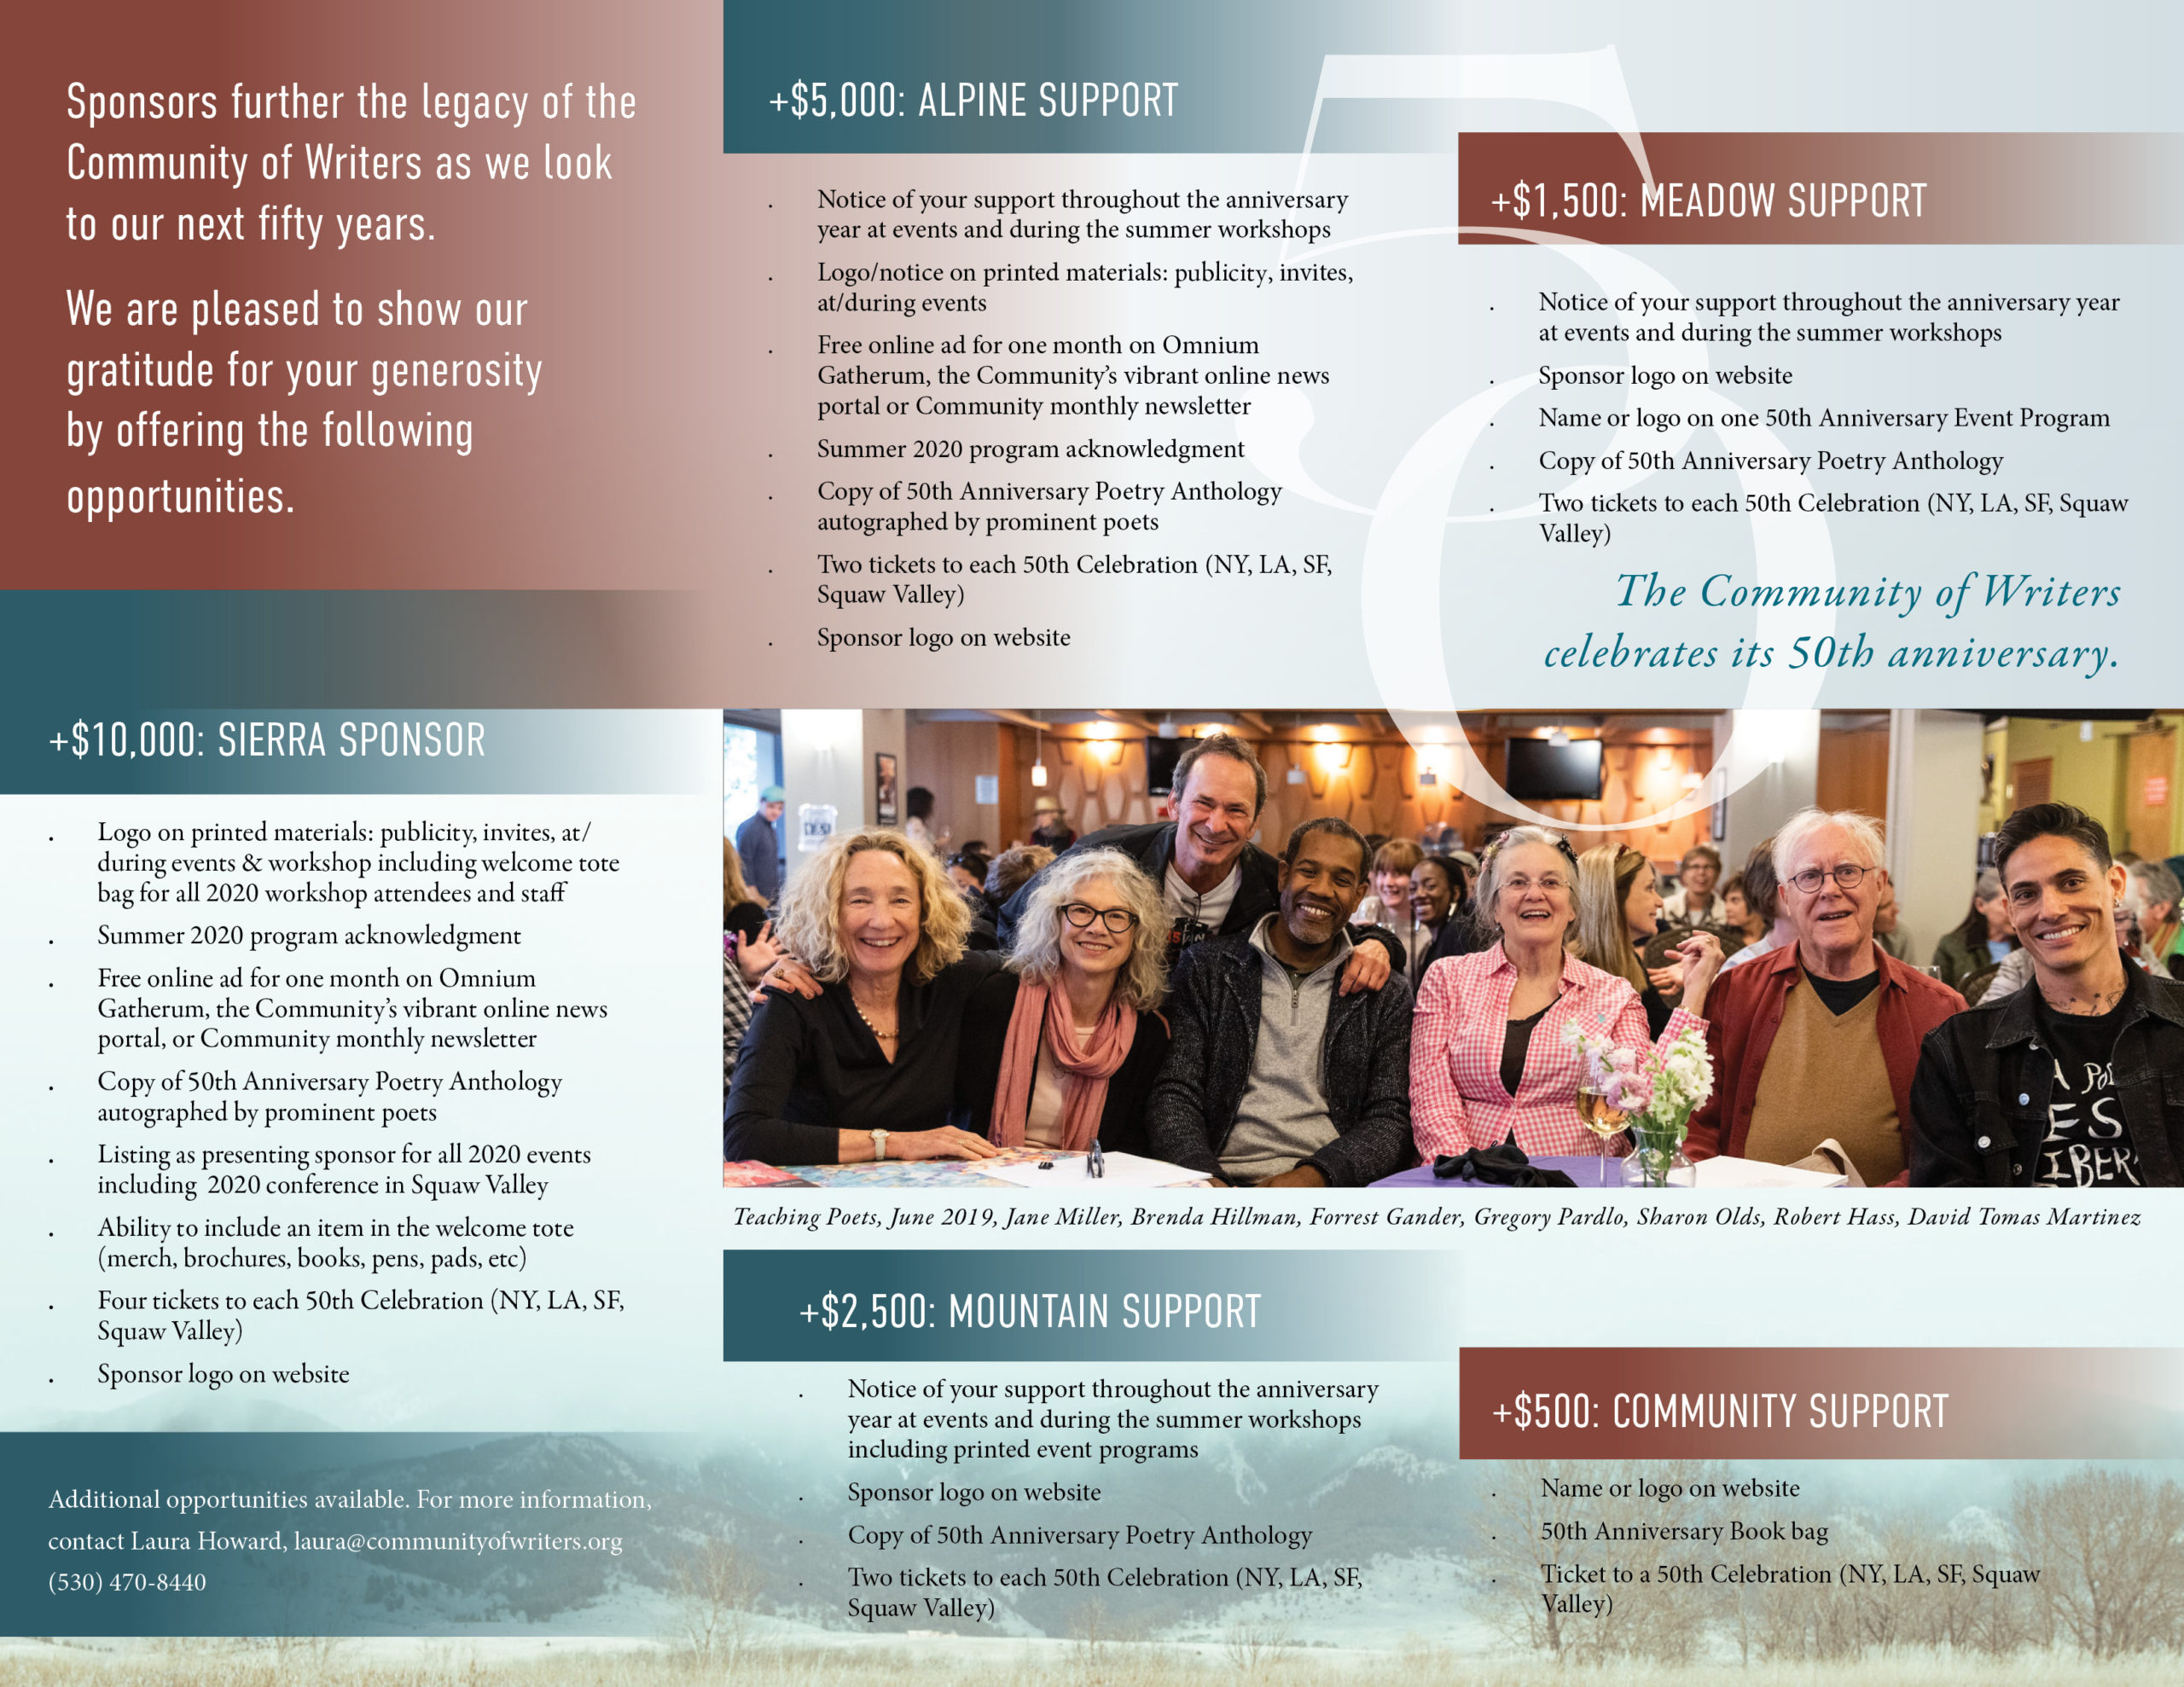 Image of Sponsorship Brochure